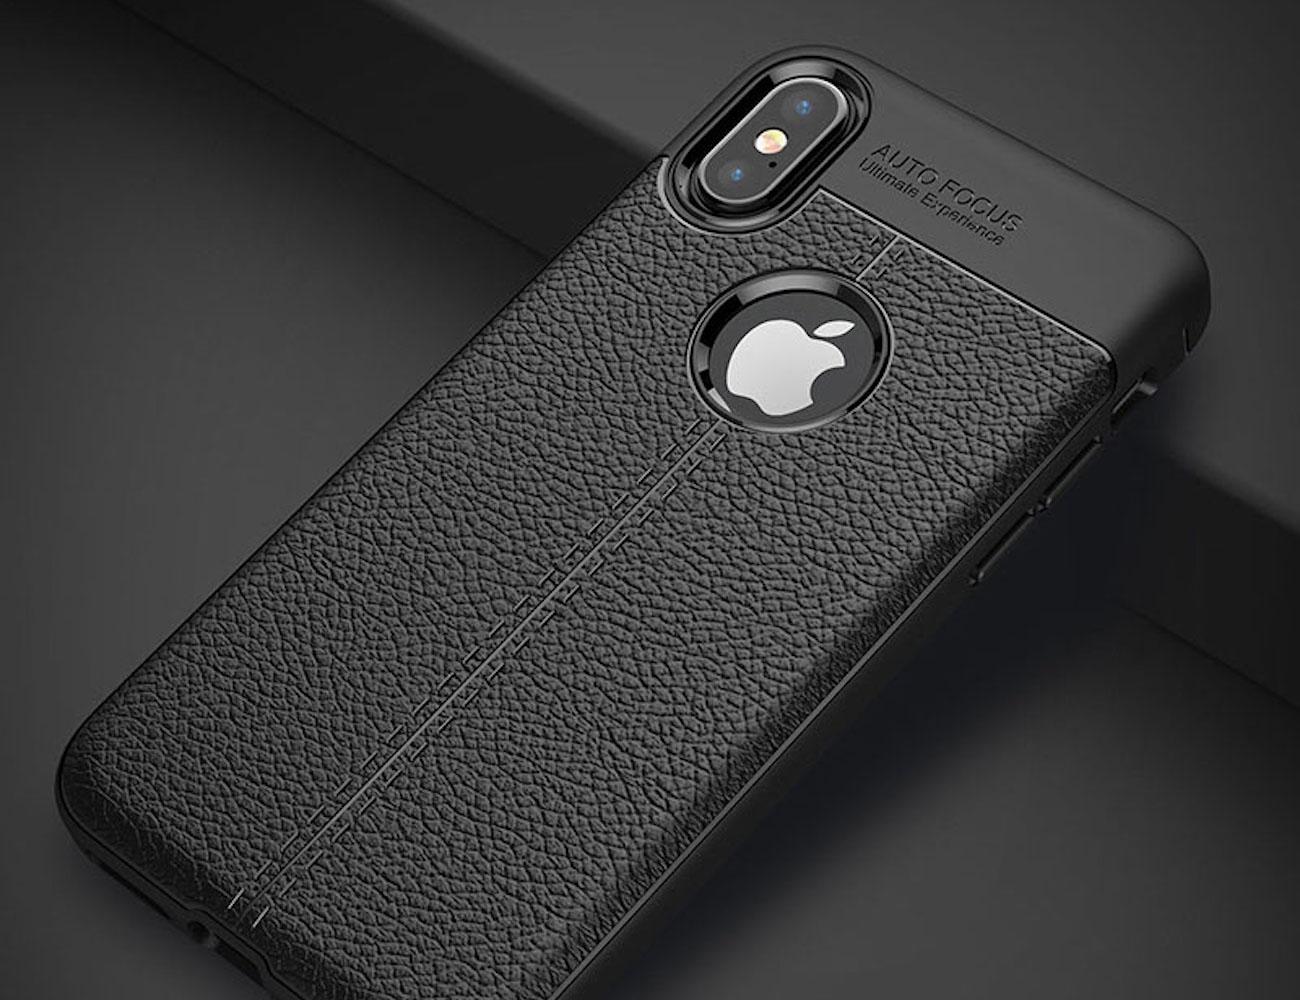 Iphonex Phone Cases: Ultra-Thin IPhone X Case » Gadget Flow